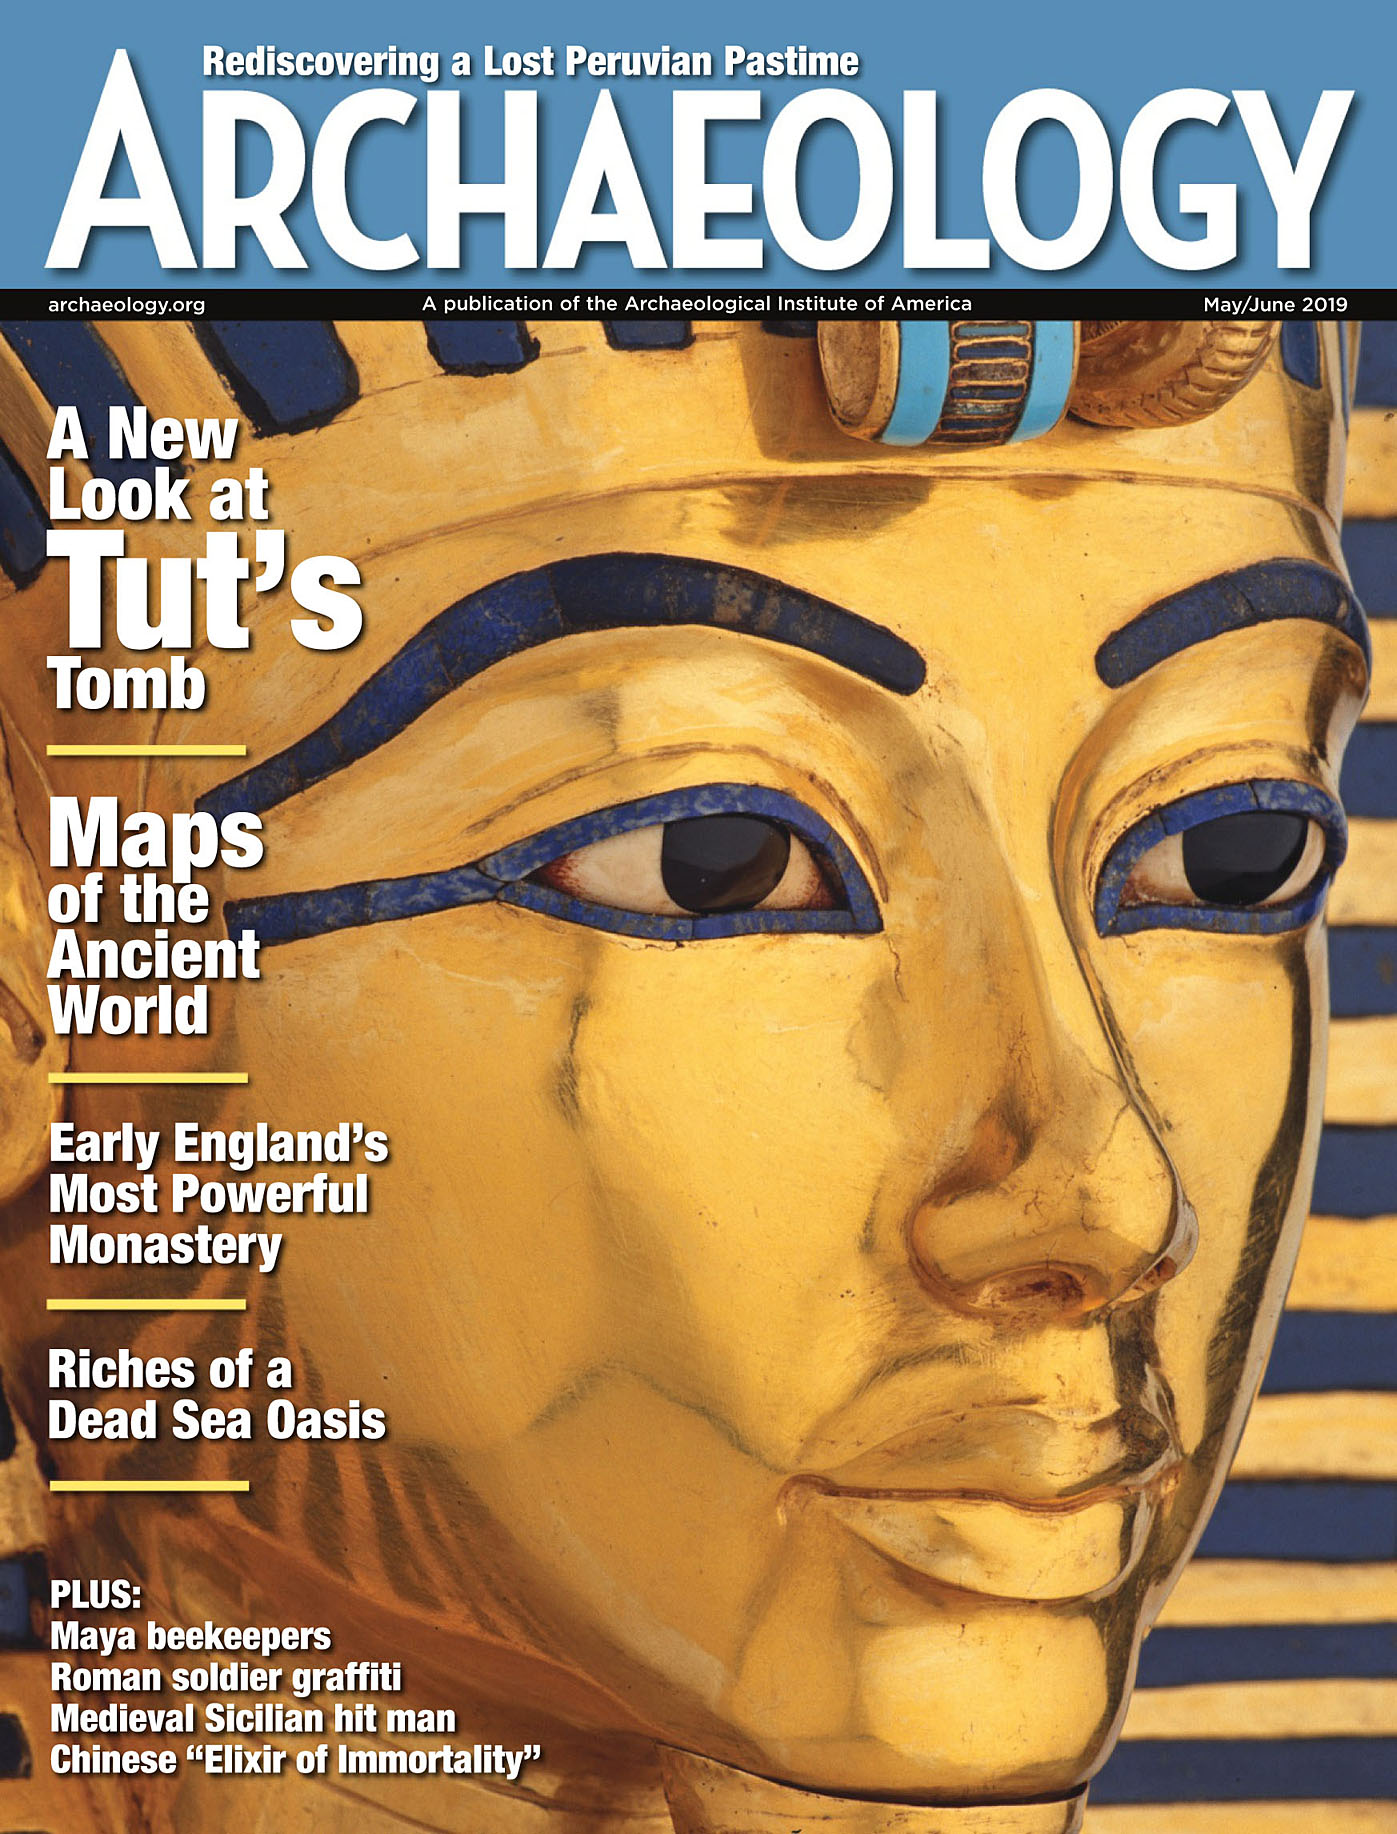 Archaeology 2019-05-06 Egypt1.jpg